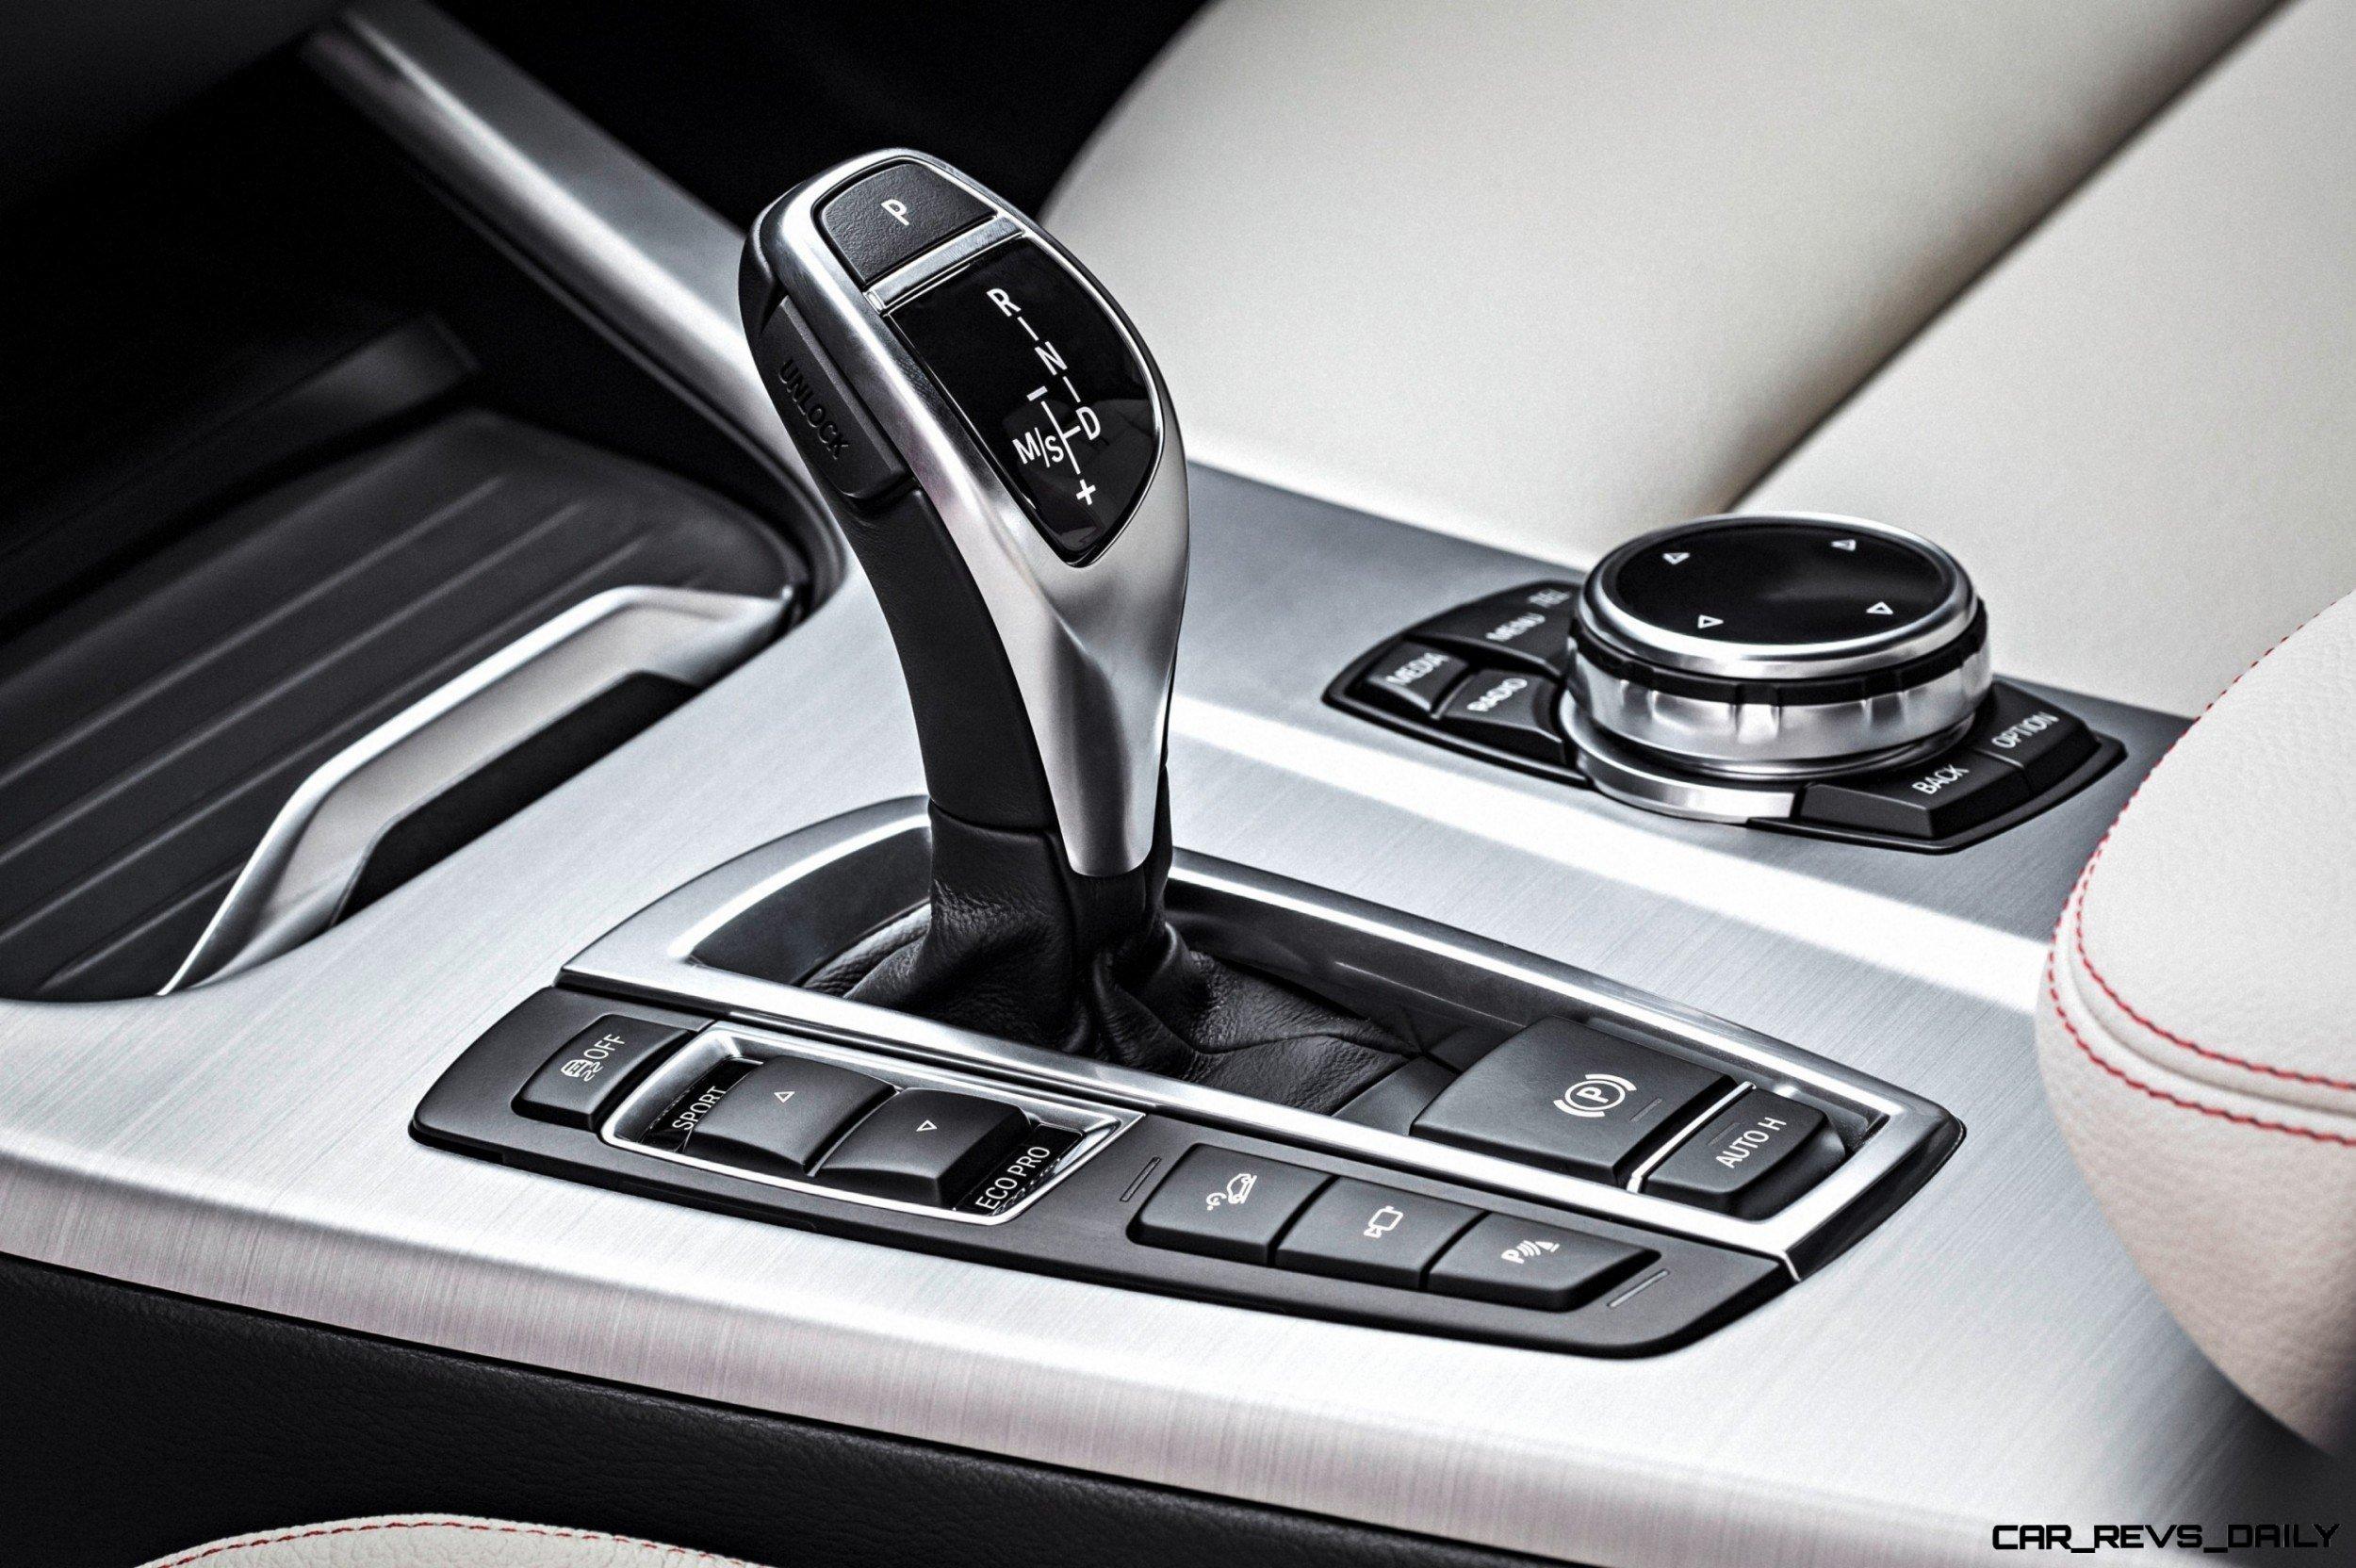 2015 BMW X4 Interior 4